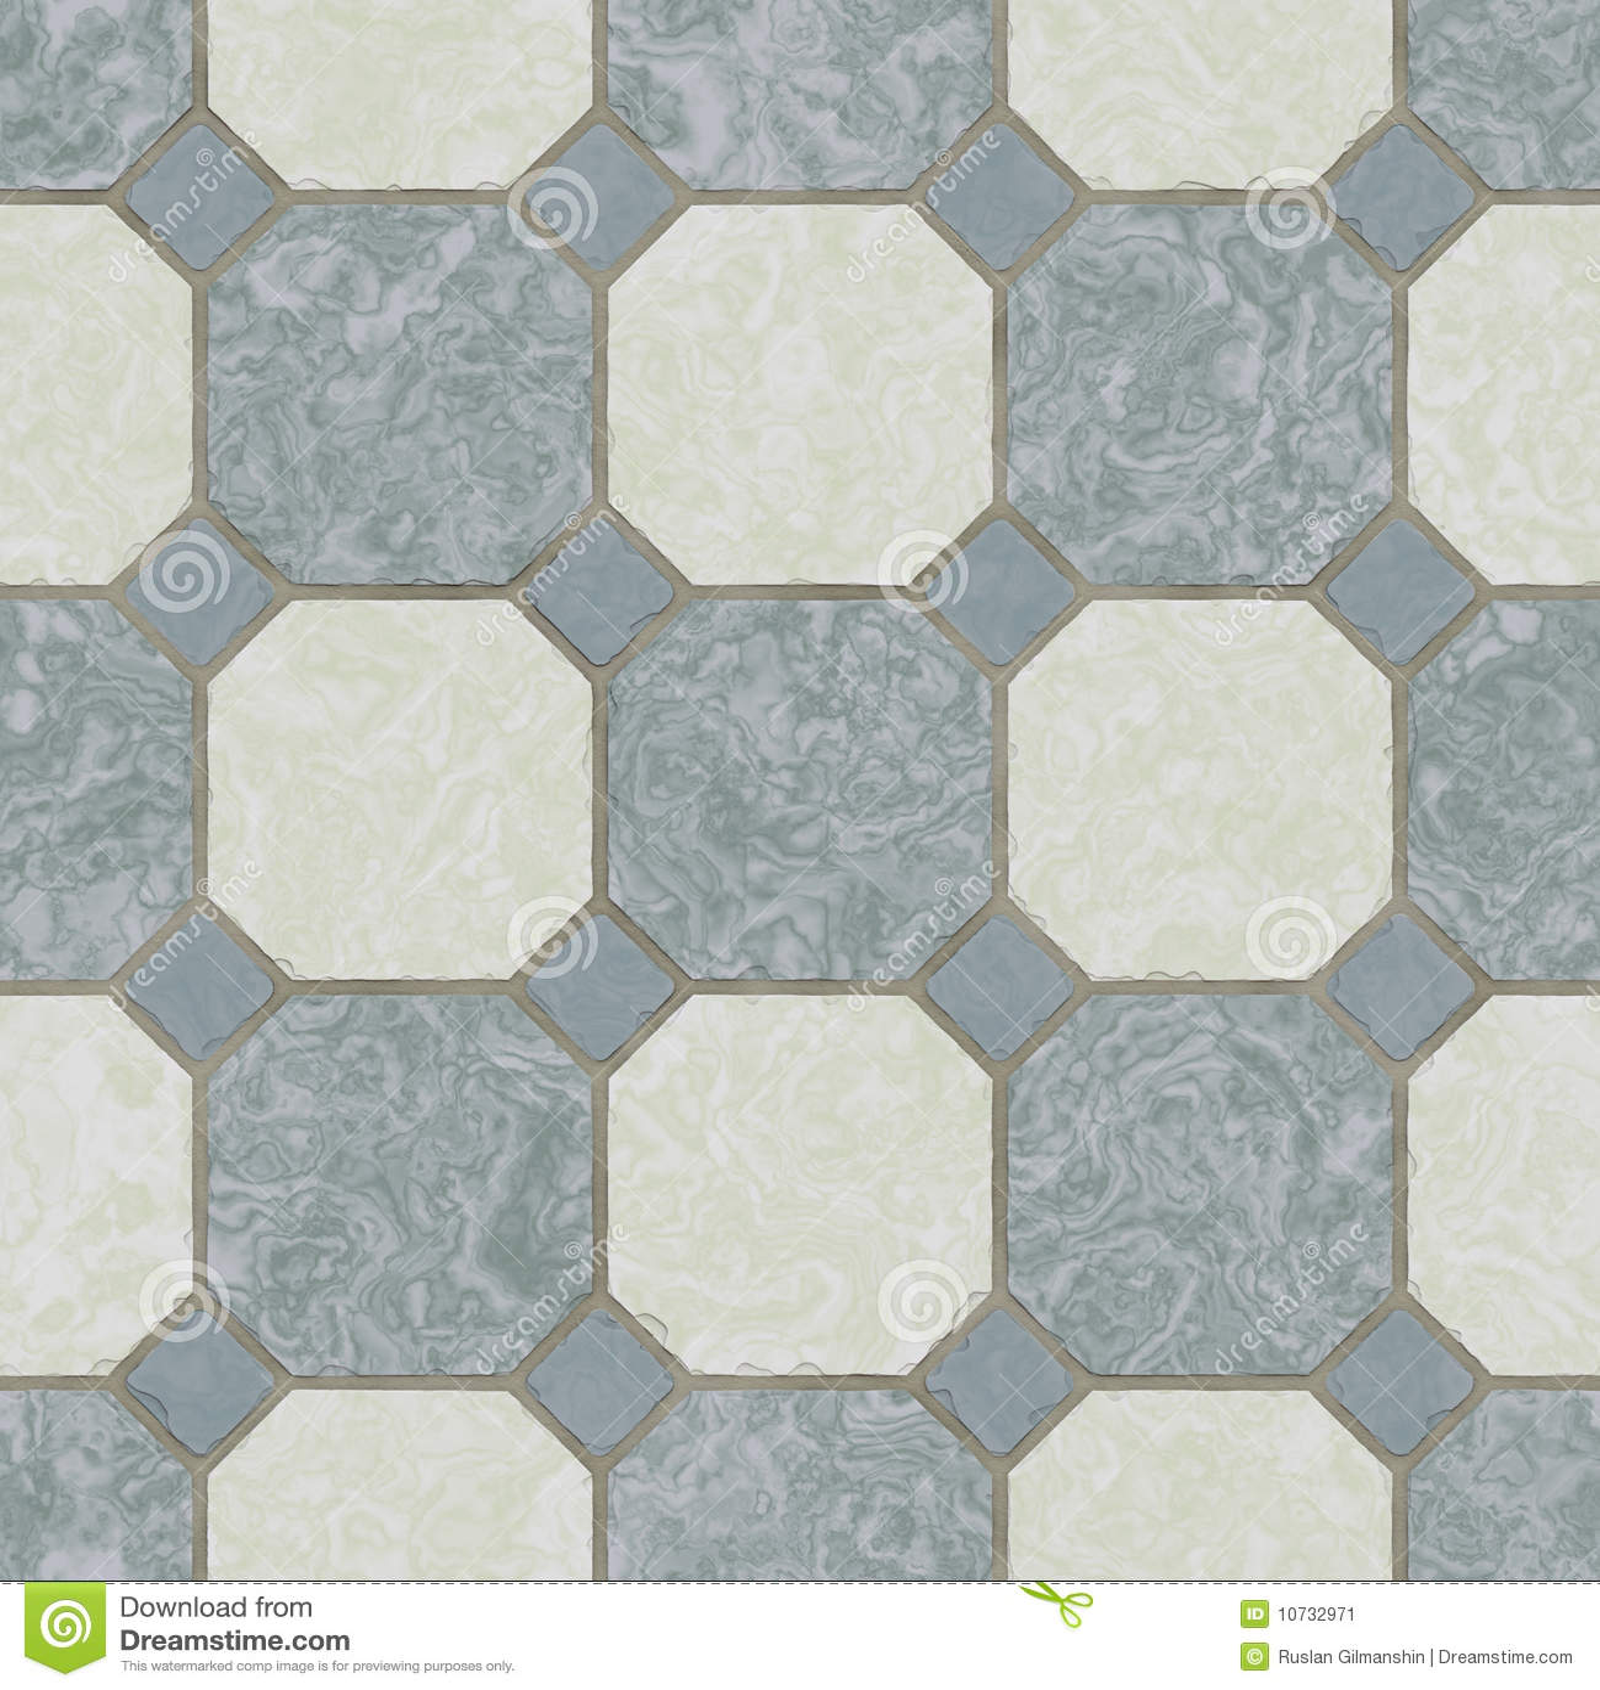 Seamless Ceramic Tile Kitchen Floor Stock Image - Image of mosaic ...